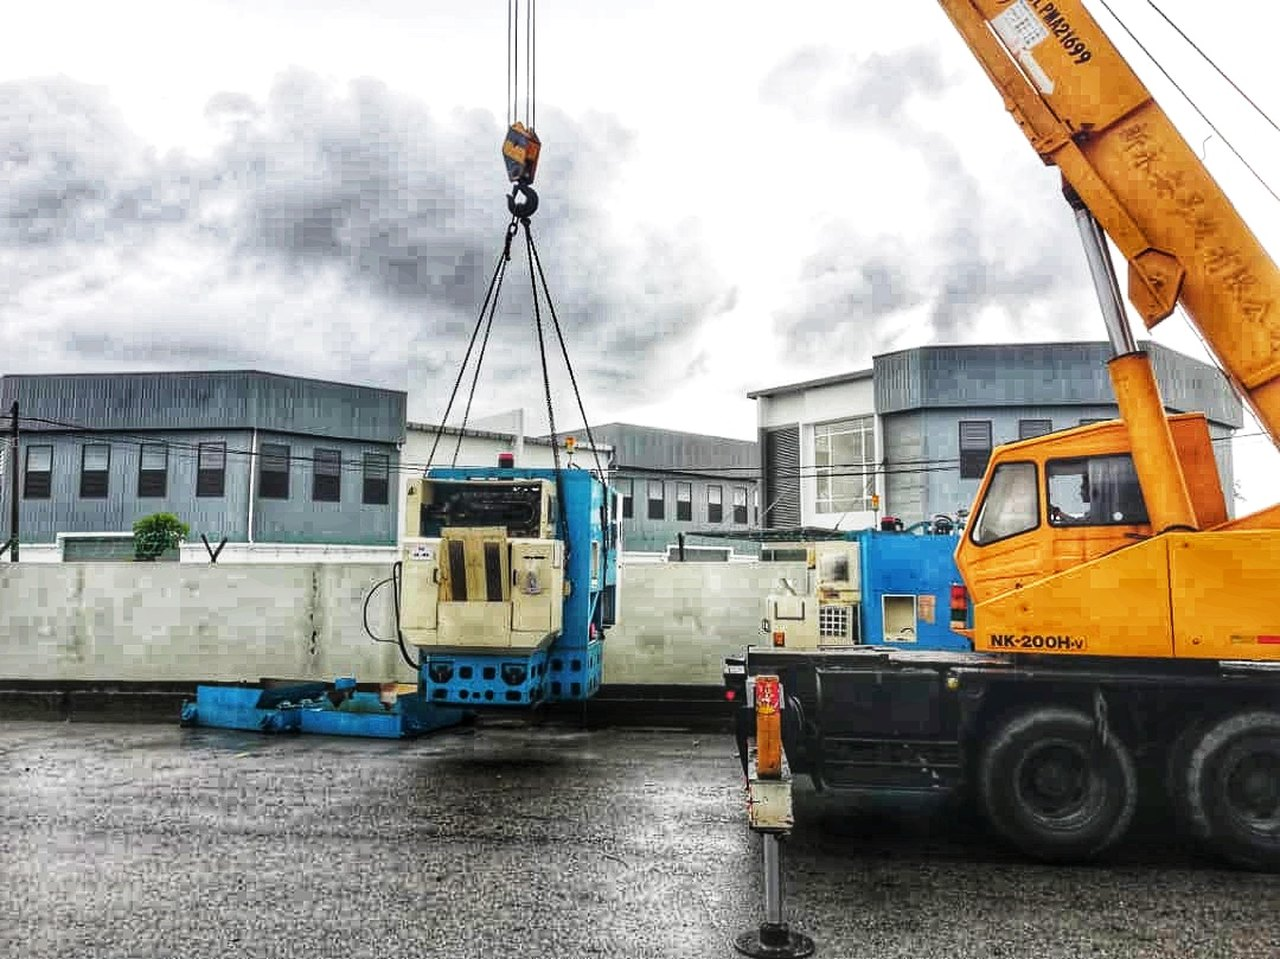 MM Century- Commercial Vehiles for Decommissioning, Dismantling, Demolition